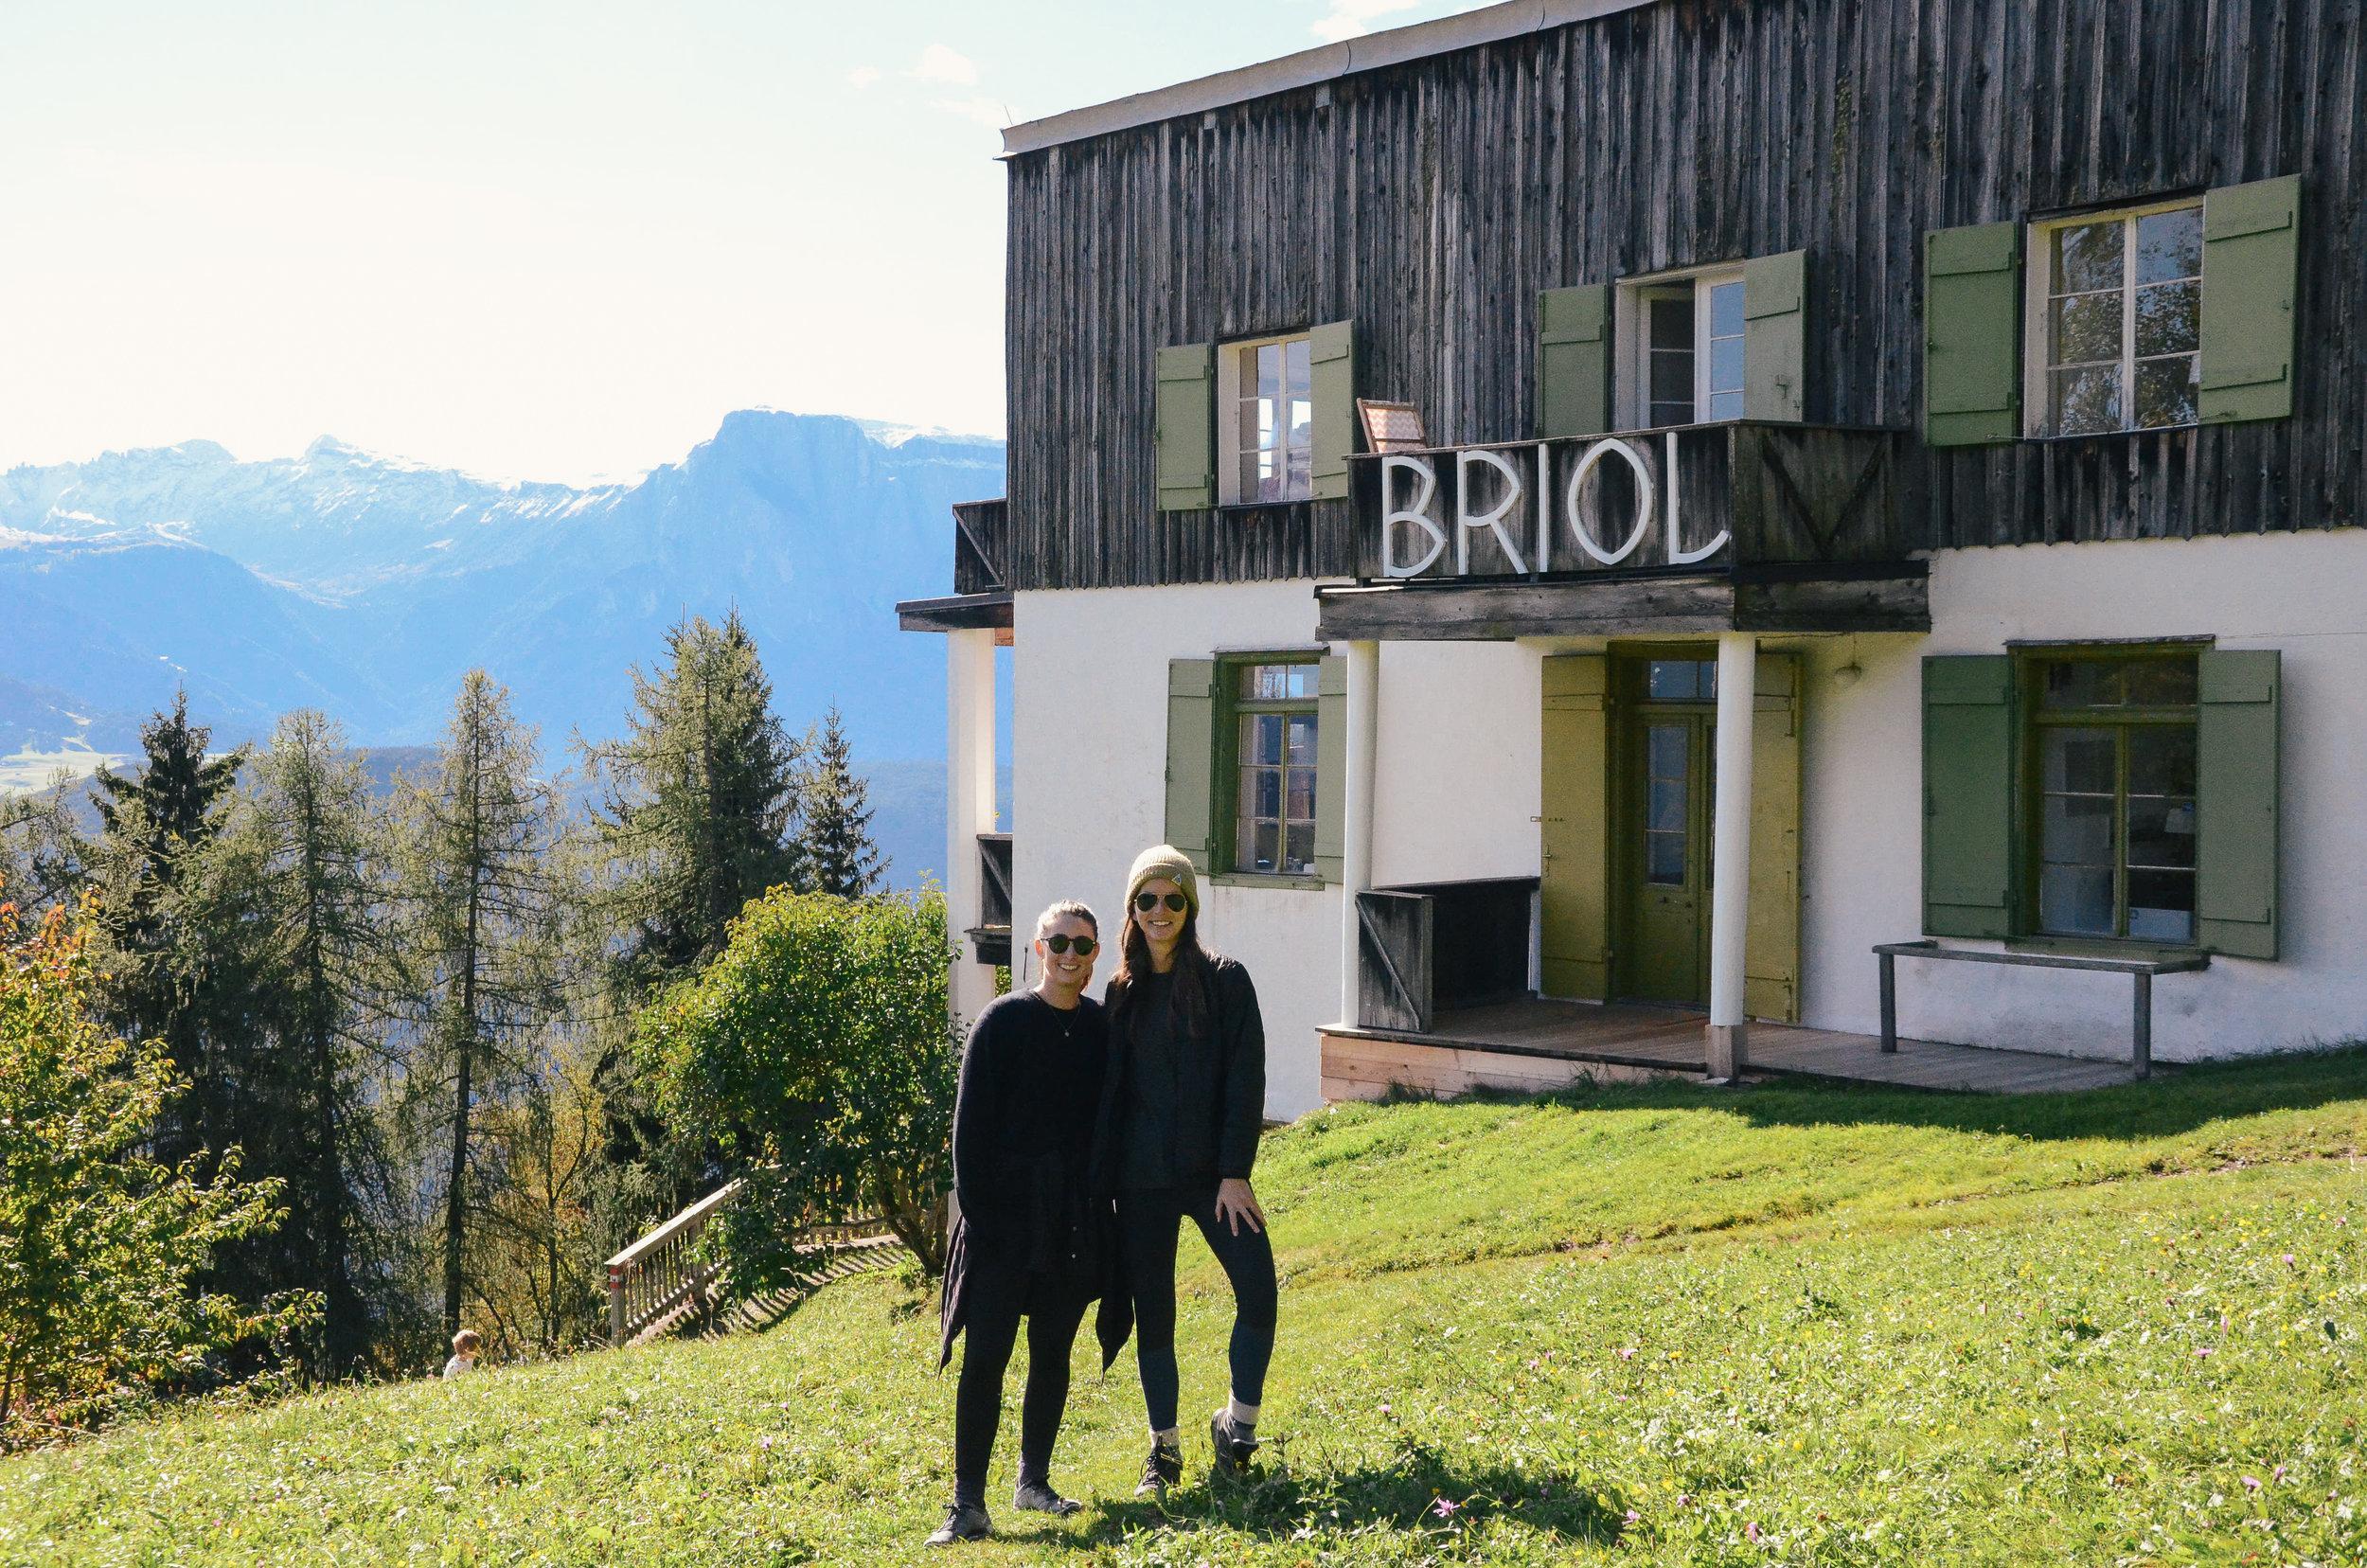 hotel_briol_dolomites_southtyrol_adventure_travel_blog_DSC_1198.jpg